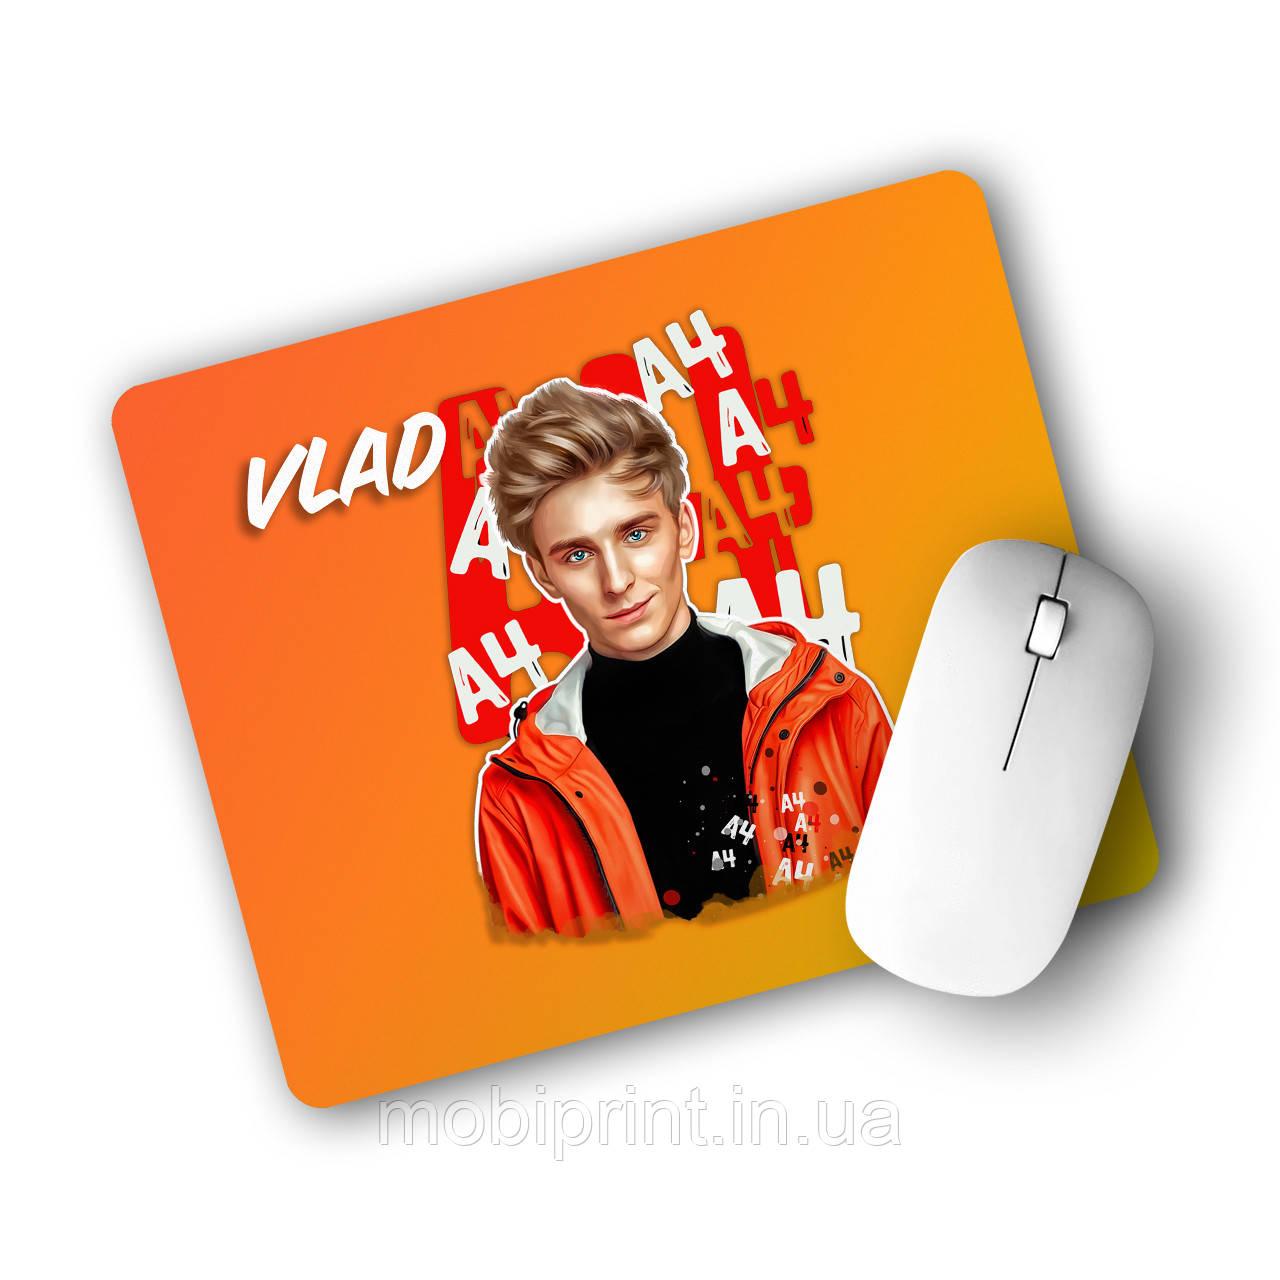 Коврик для мышки блогер Влад Бумага А4 (blogger Vlad A4)  (25108-2619)